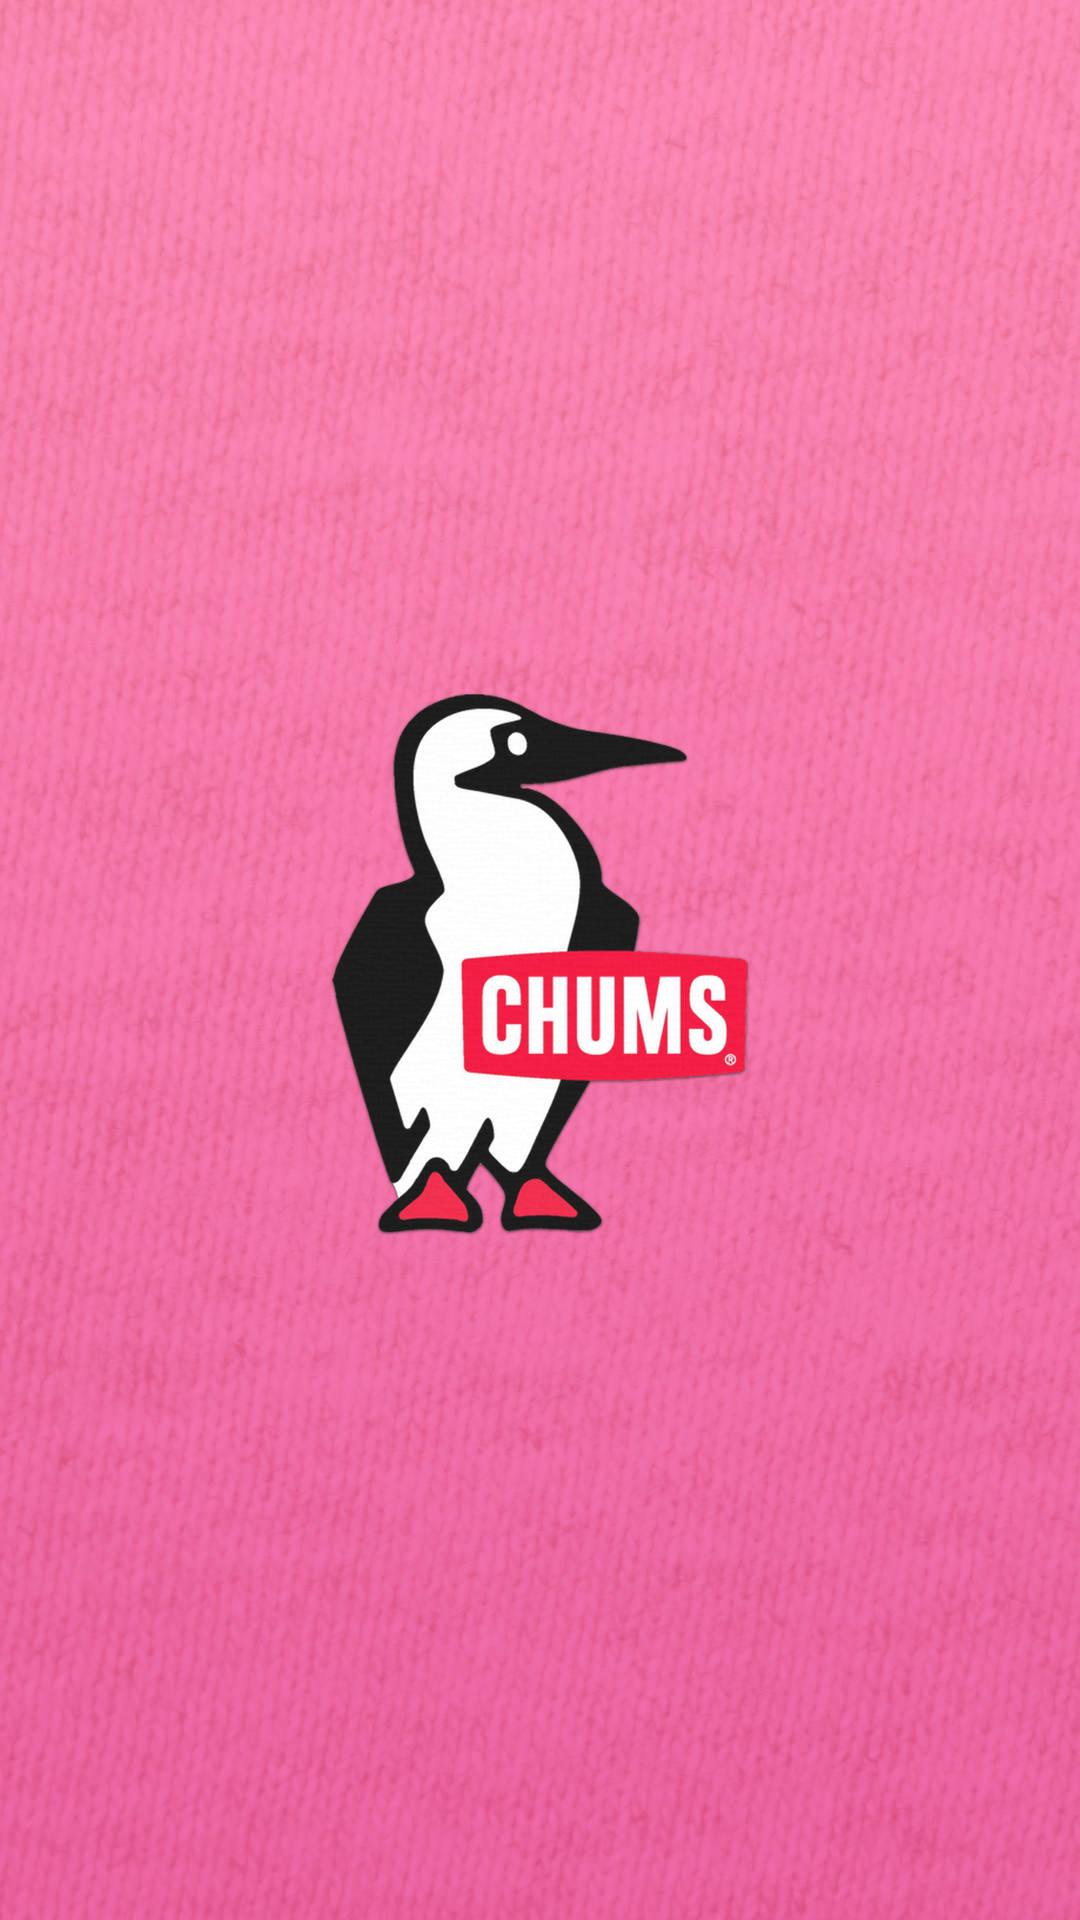 chums03 - CHUMS[チャムス]の高画質スマホ壁紙50枚 [iPhone&Androidに対応]